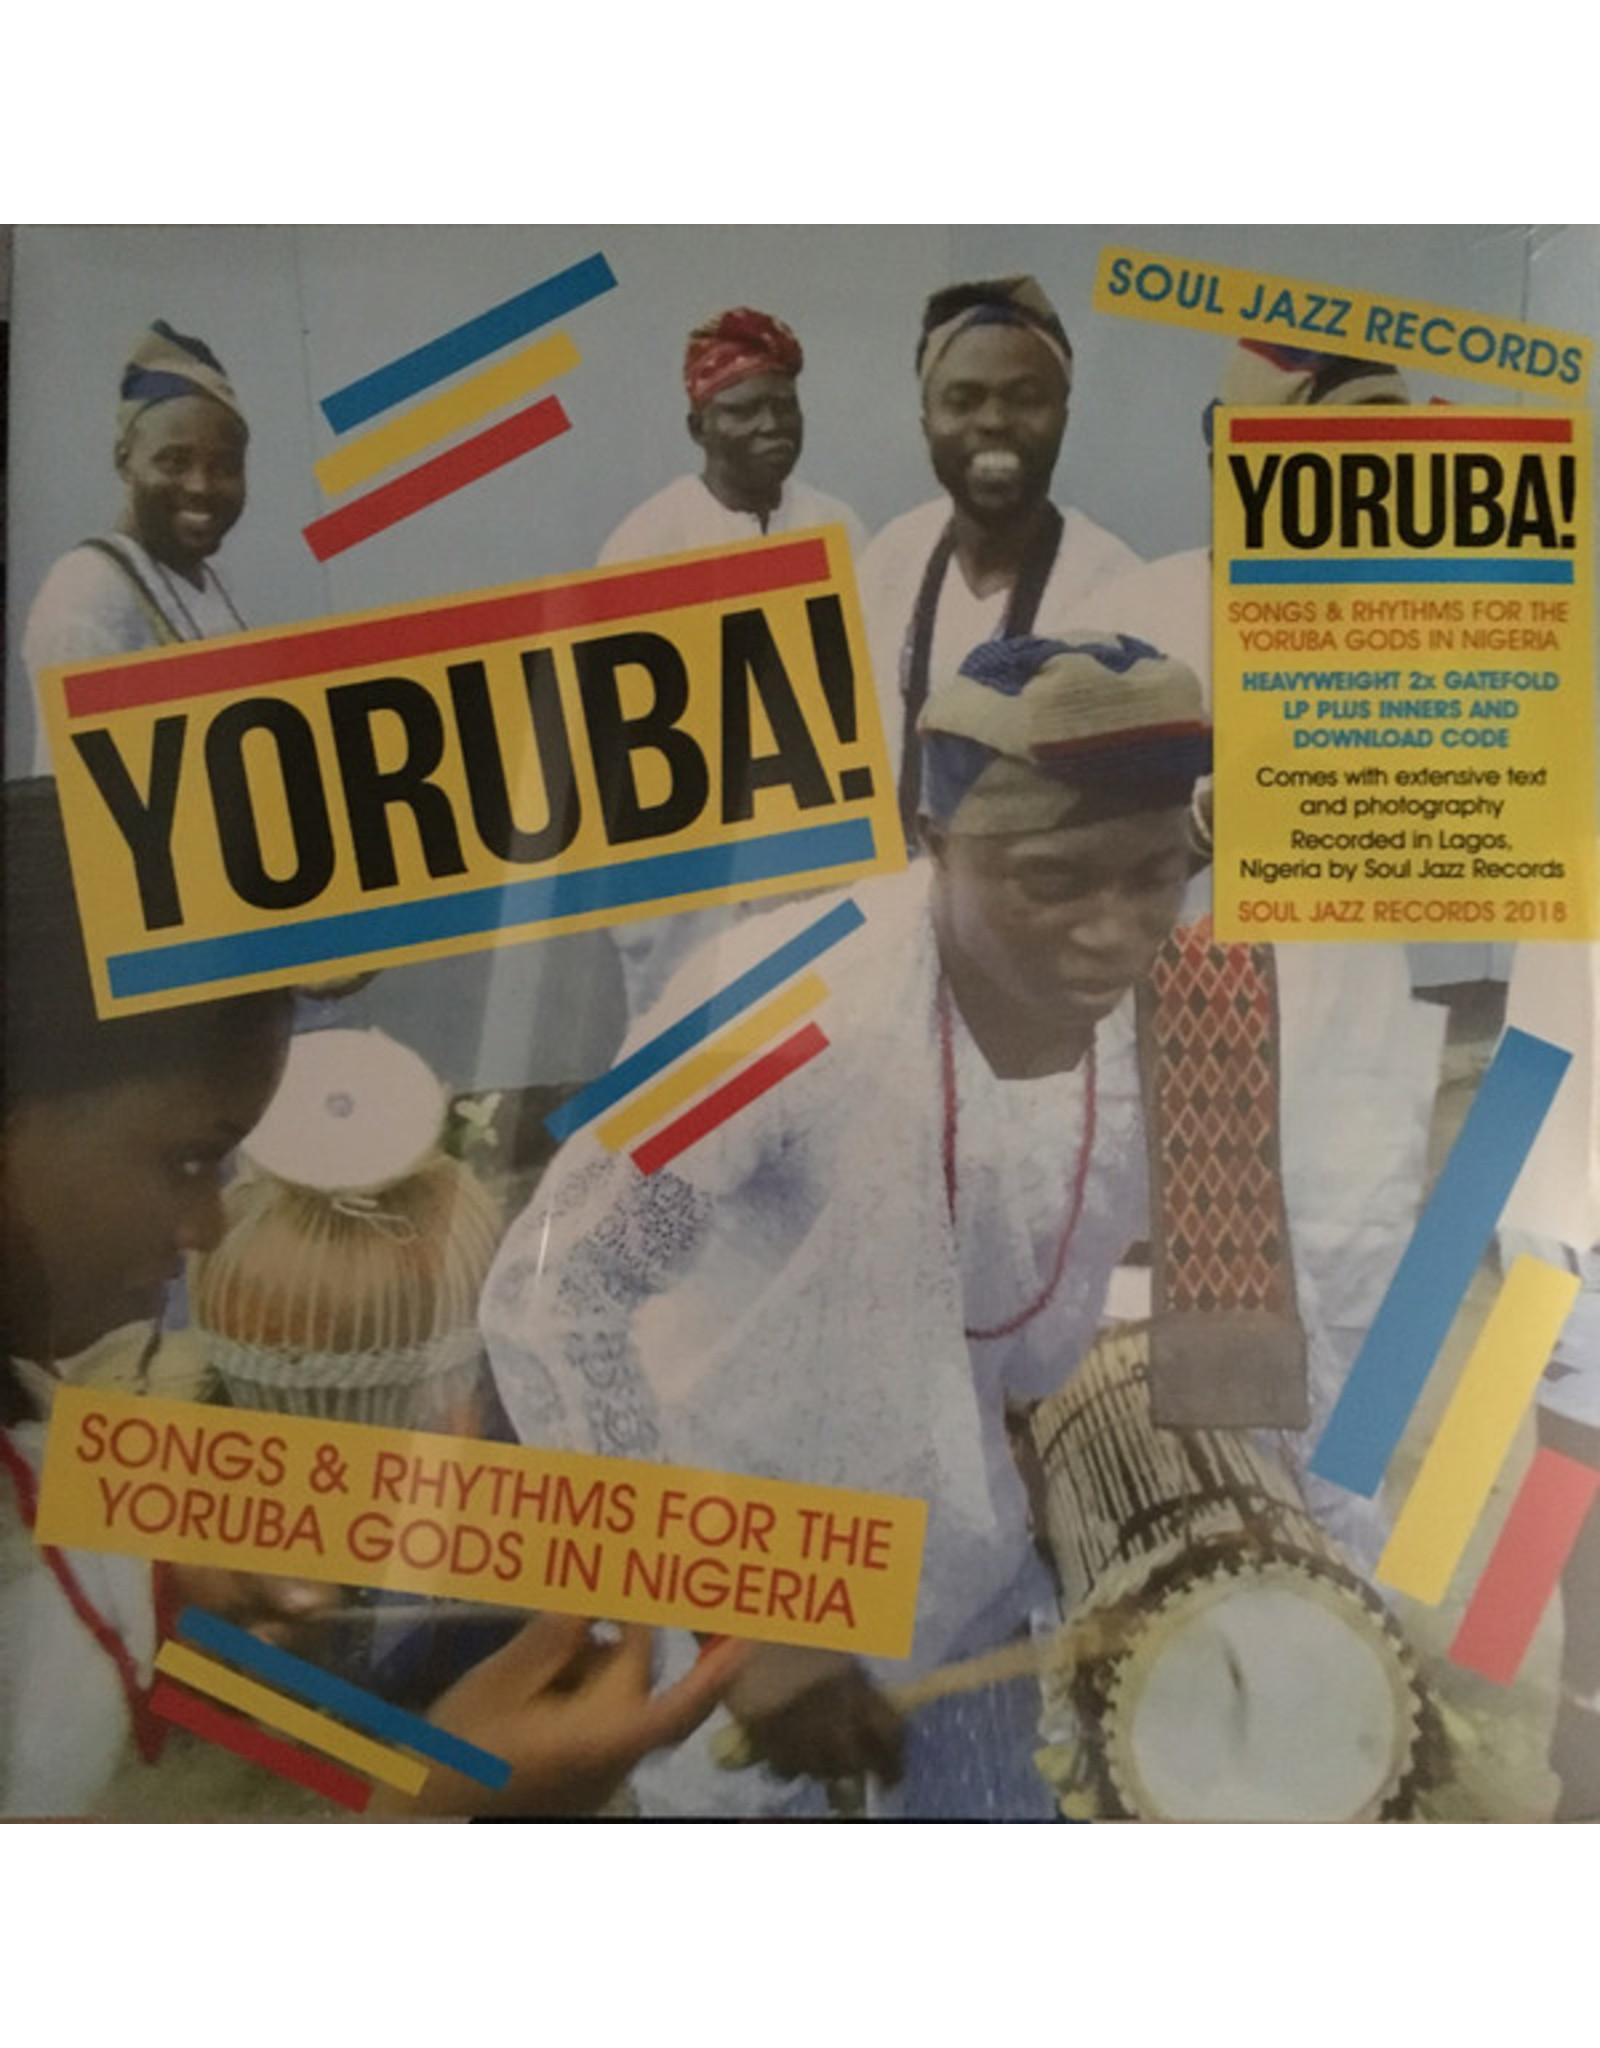 New Vinyl Konkere Beats - Yoruba! Songs & Rhythms For The Yoruba Gods In Nigeria 2LP